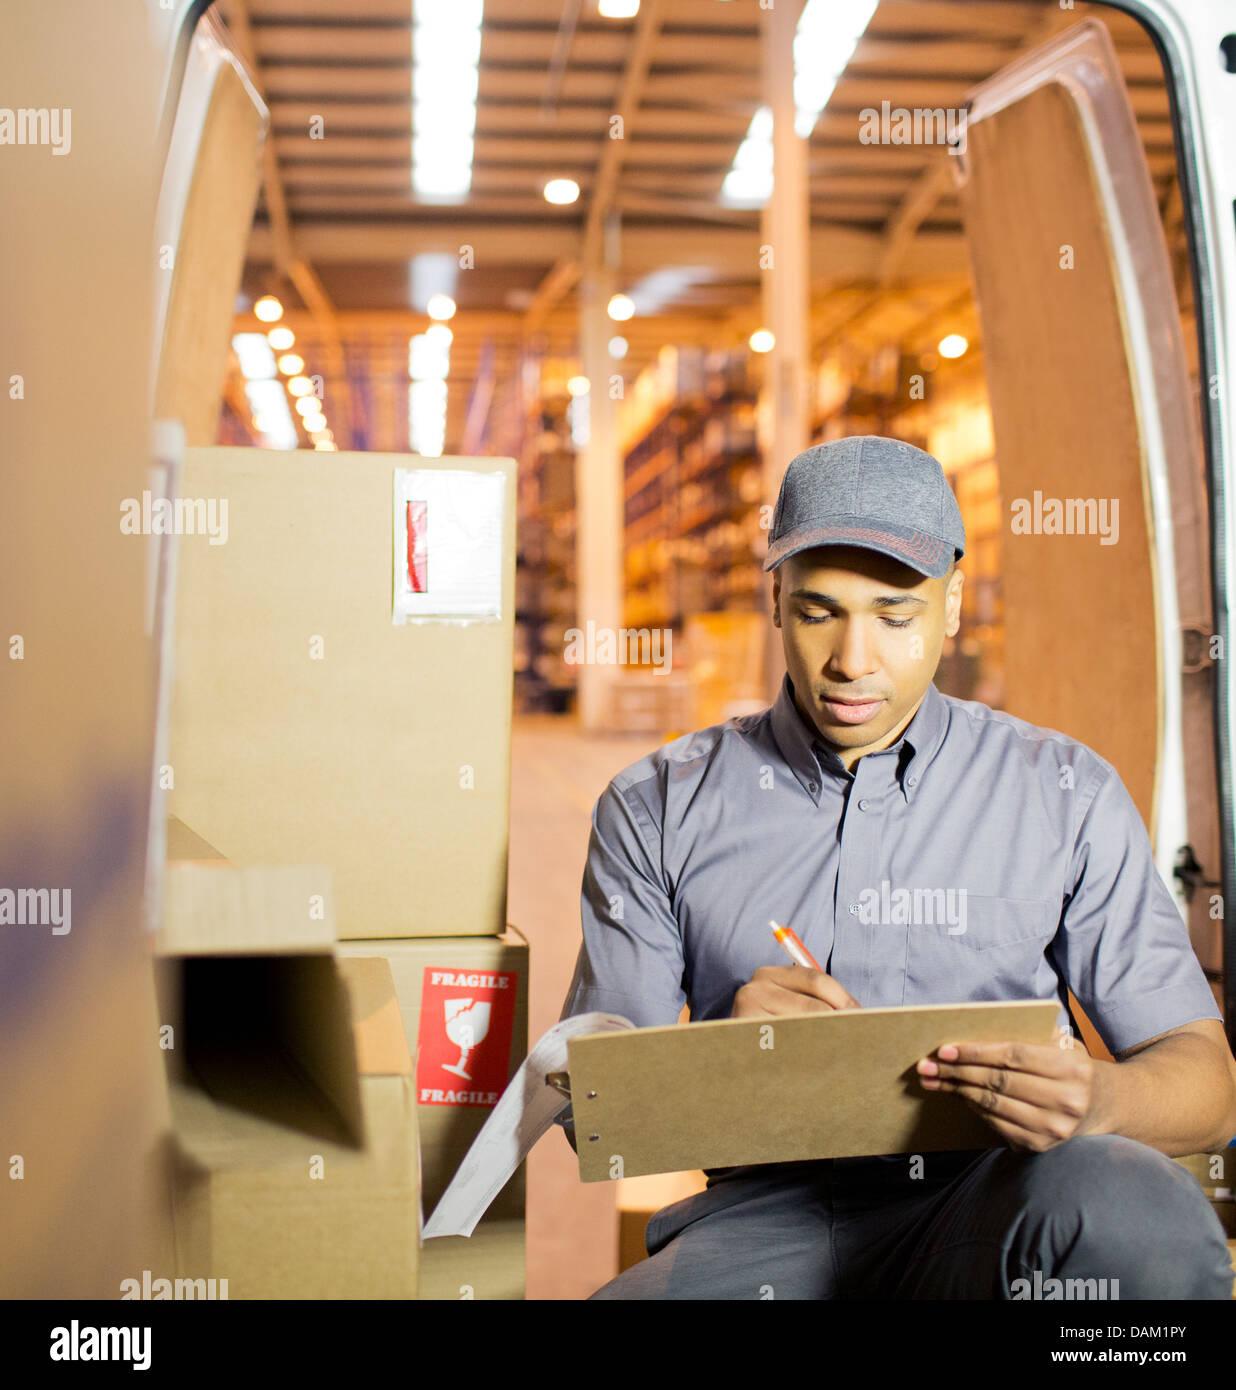 Delivery boy using clipboard in van - Stock Image